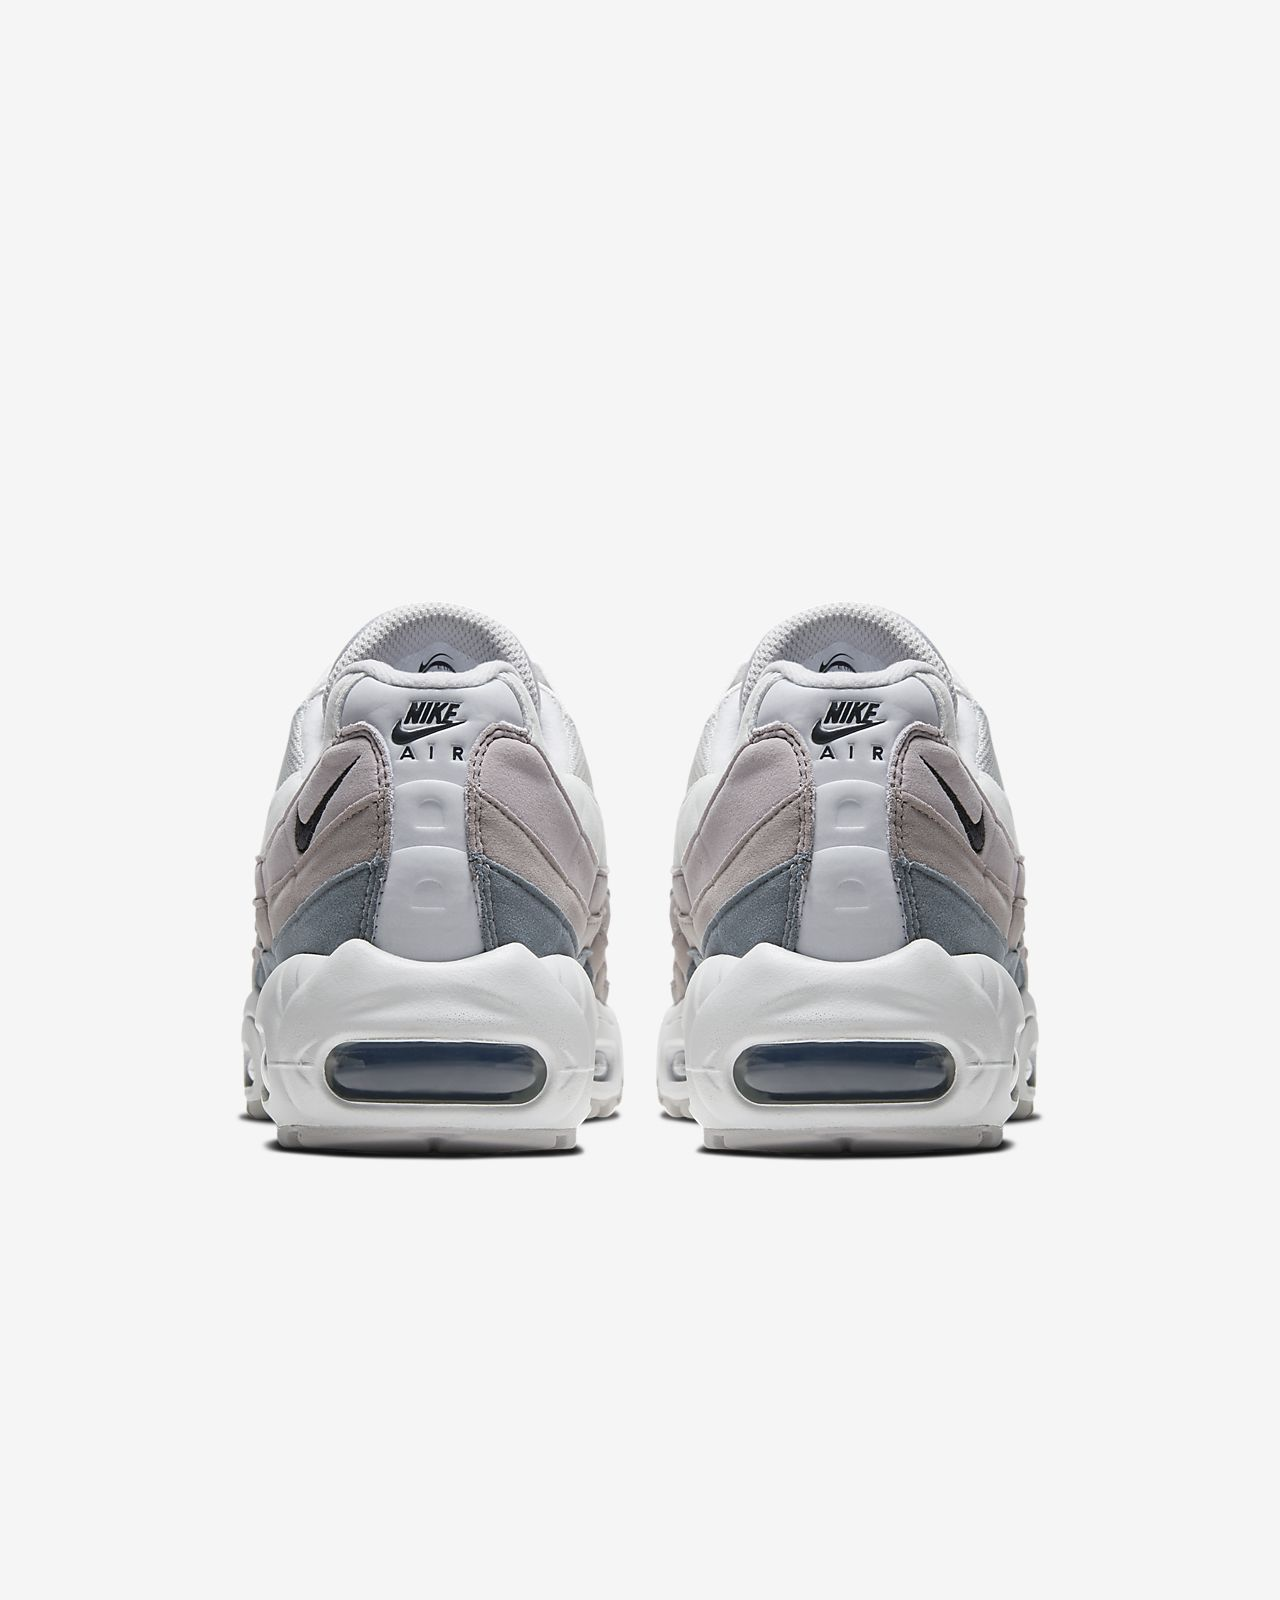 official photos e5689 cc344 ... Nike Air Max 95 Women s Shoe